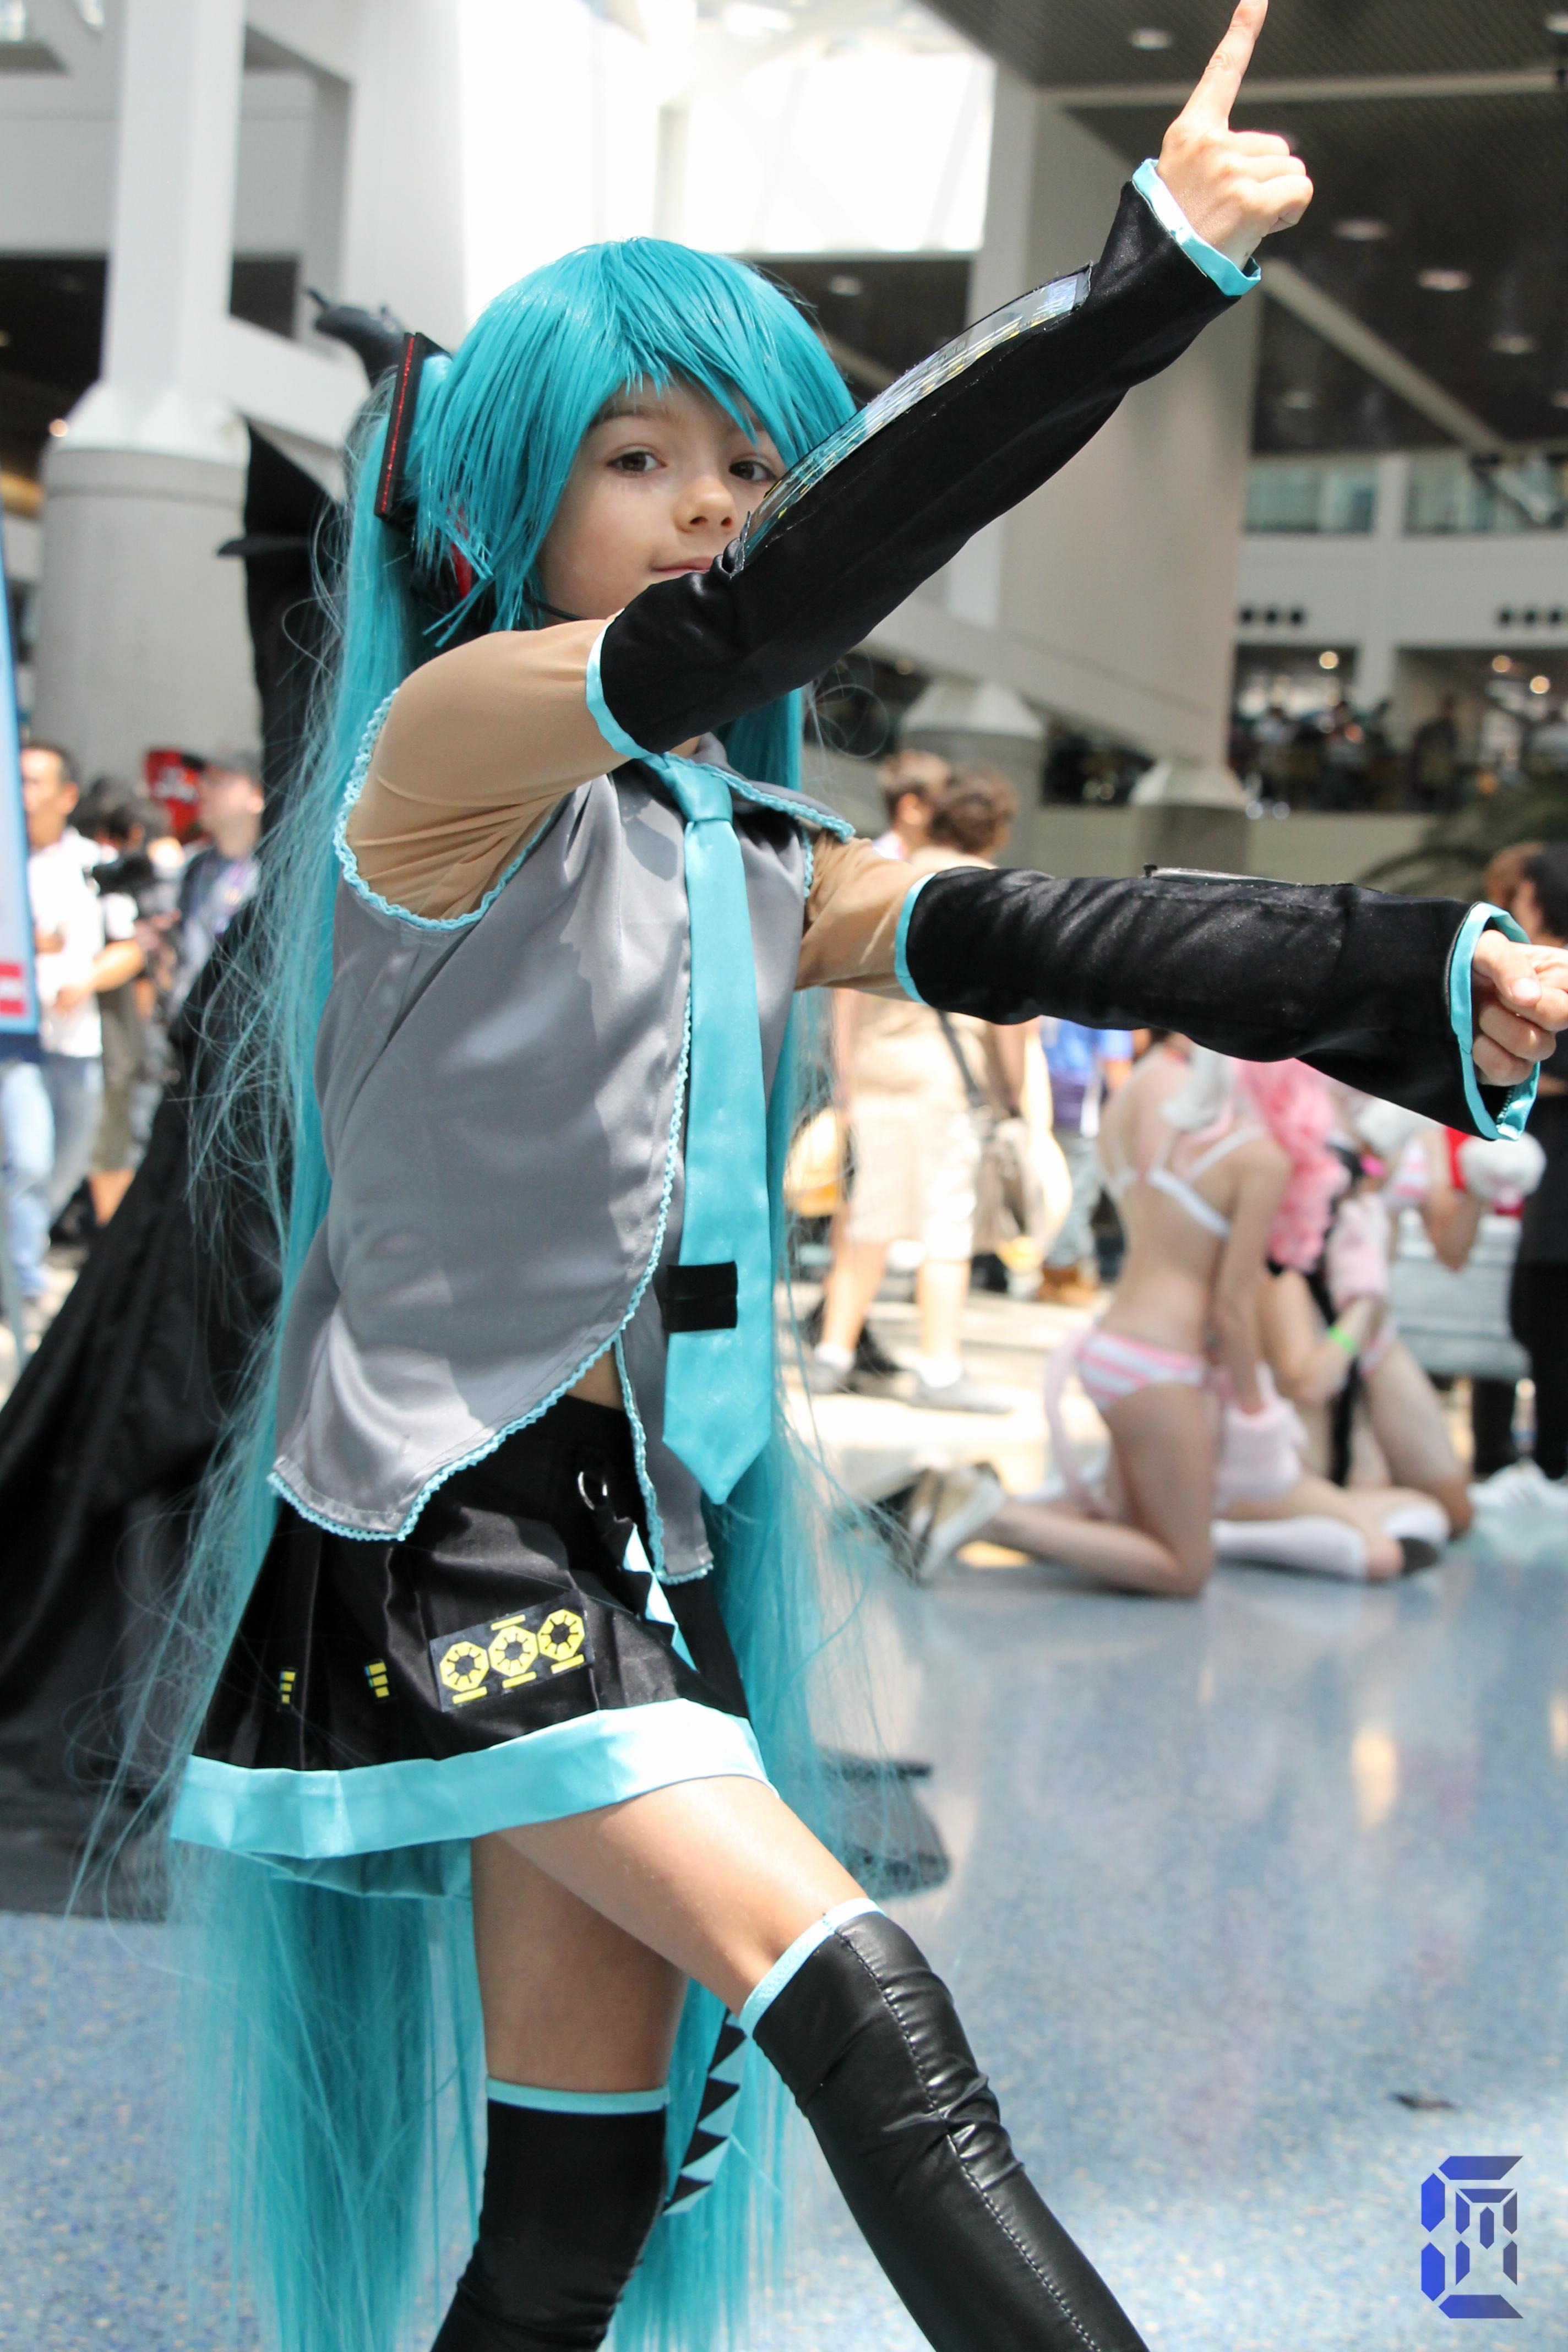 File Hatsune Miku Coser At Anime Expo 20170704 1 Jpg